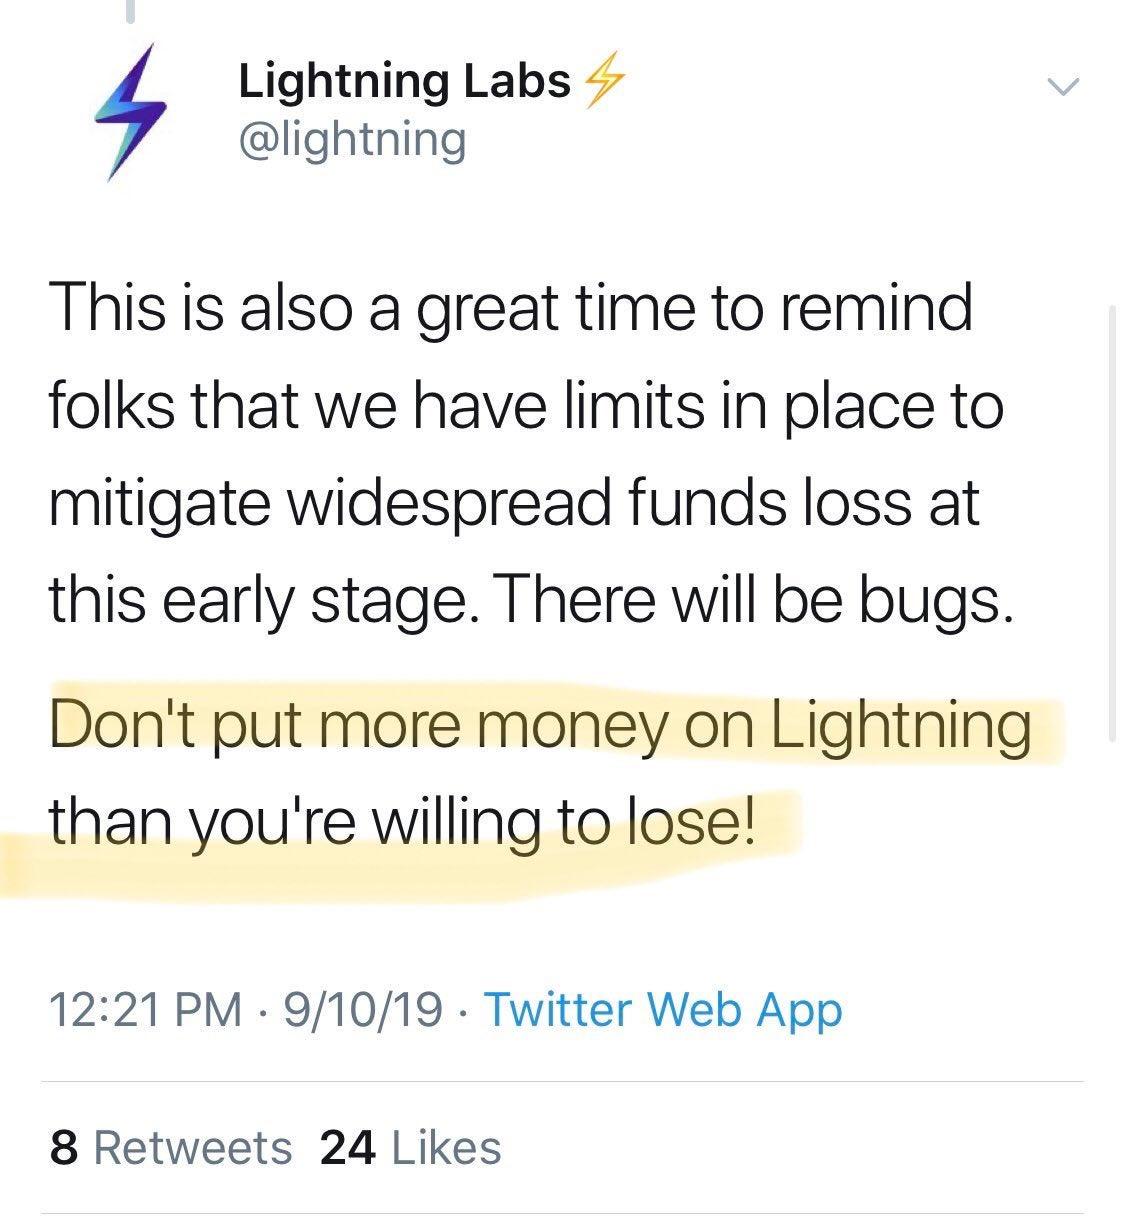 Lightning Labs tweet